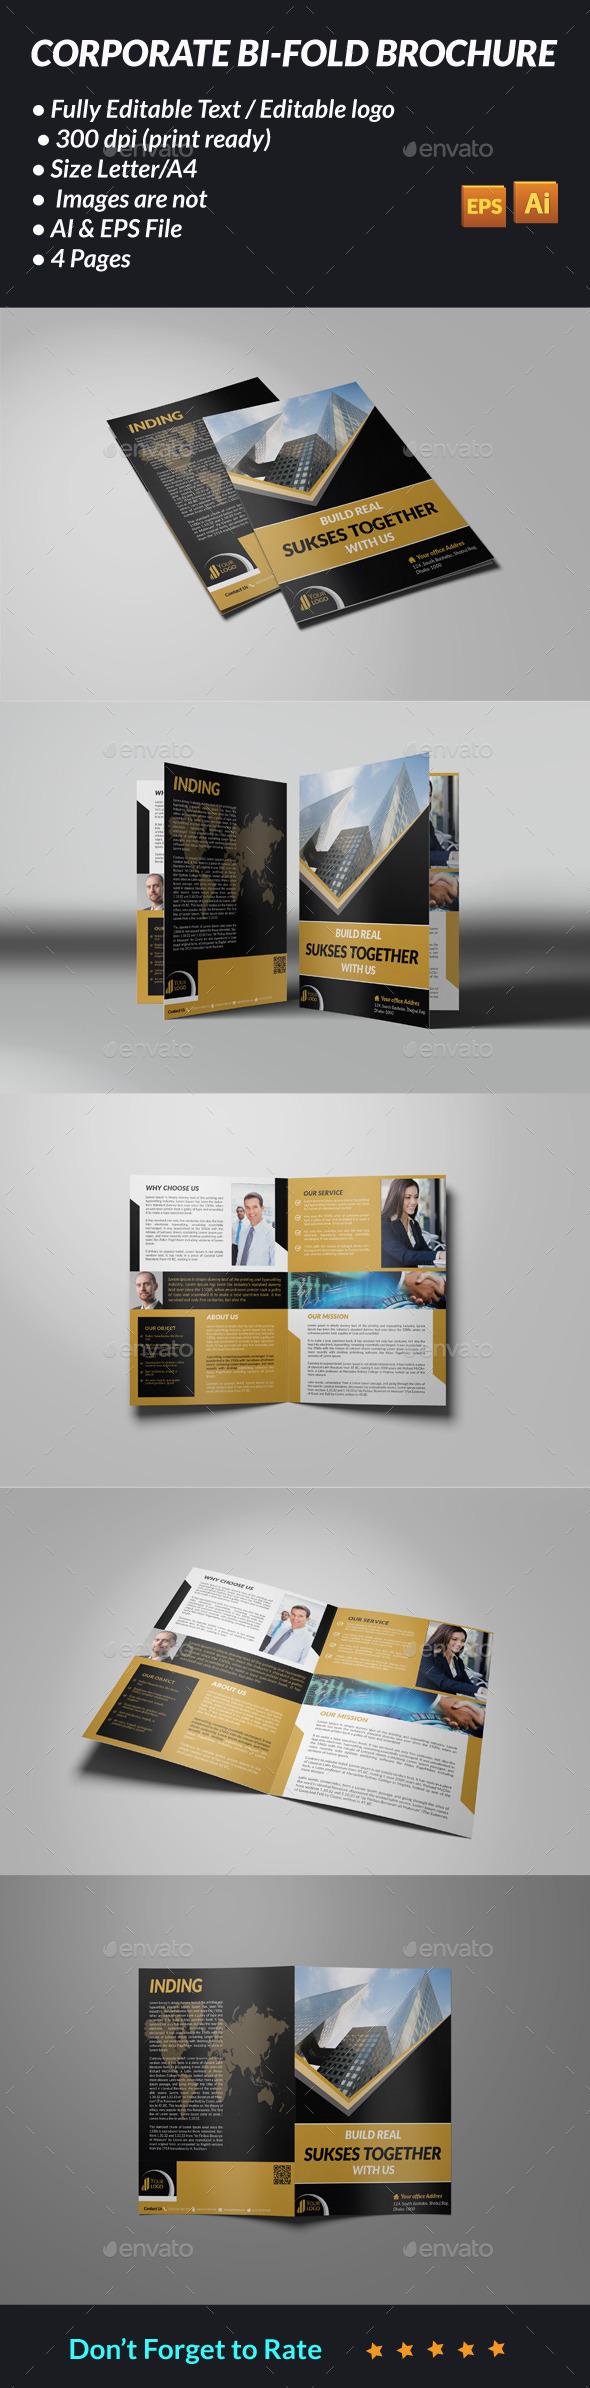 GraphicRiver Corporate Bi-Fold Brochure 11316024